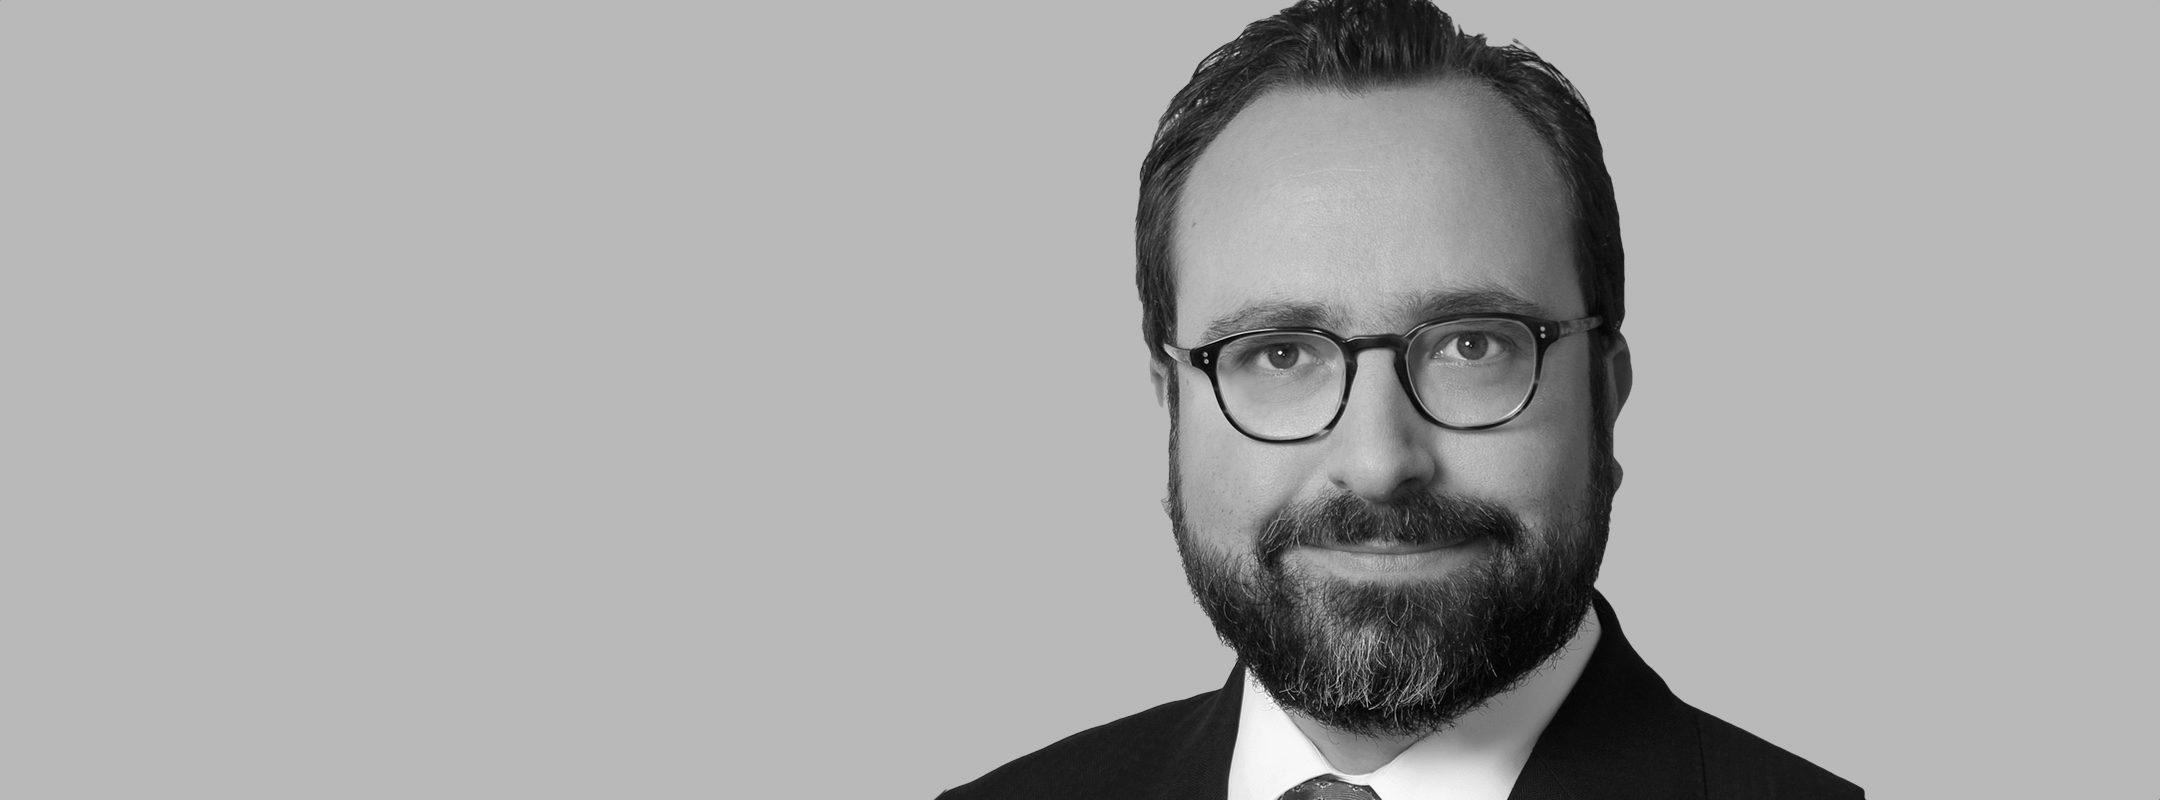 Steffen Hörner Steuerrecht HSF Partner Herbert Smith Freehills Steuerabteilung Steuerberater